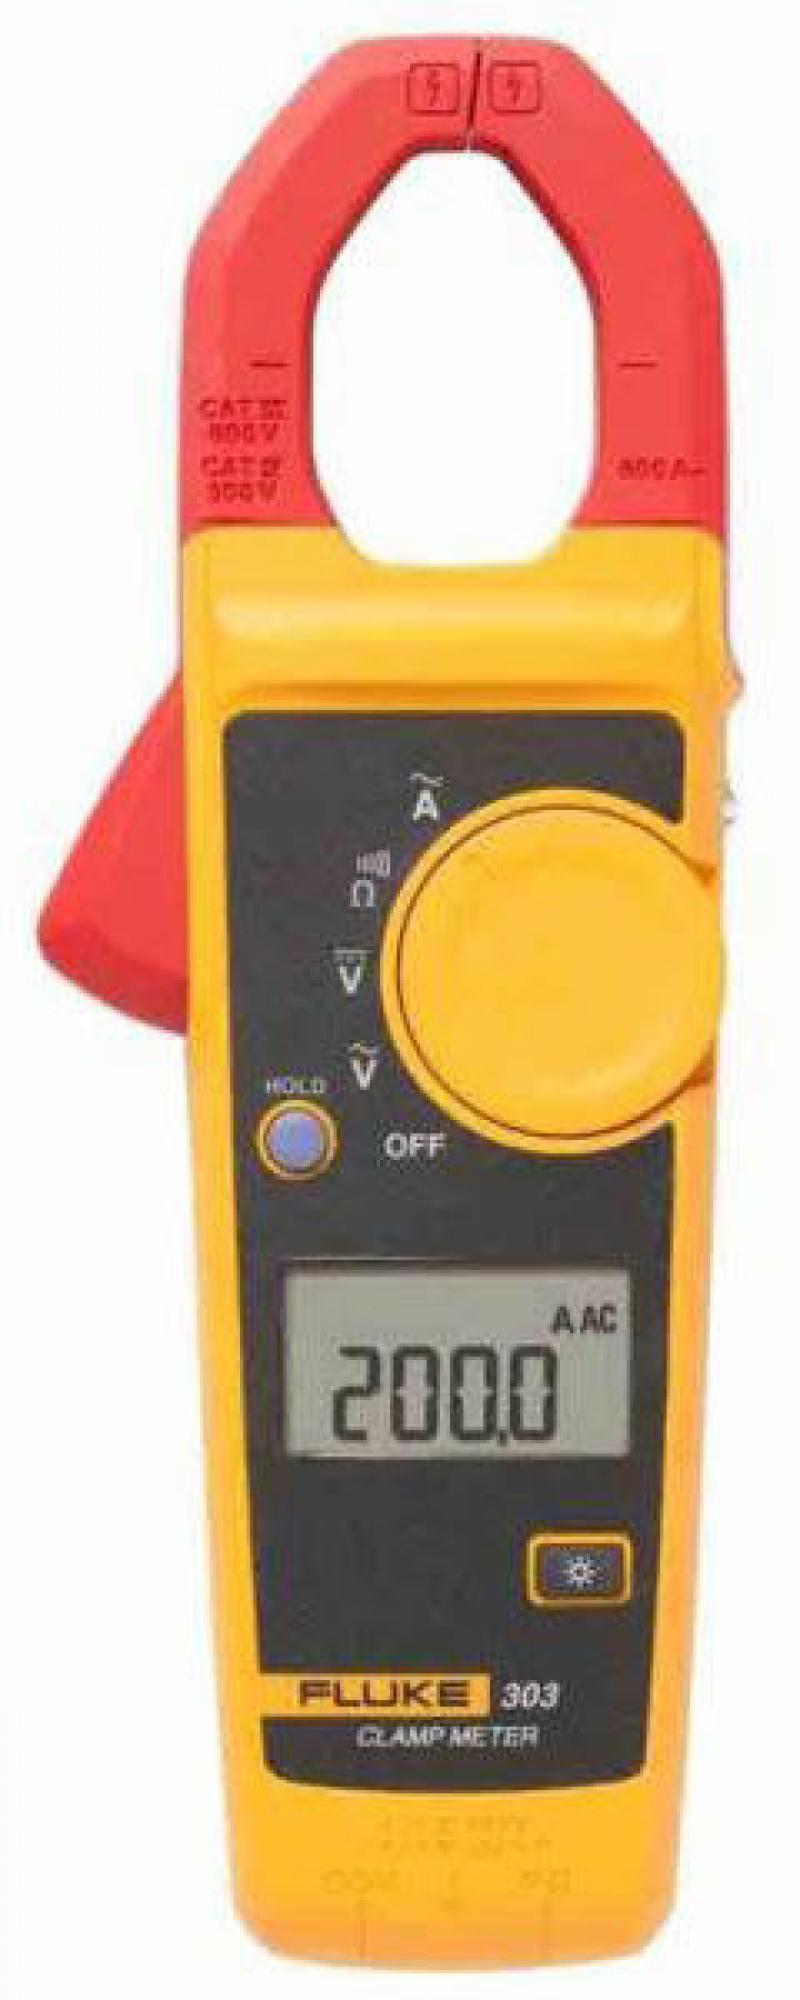 Клещи Fluke IG FLUKE-303/EM ERTA мультиметр fluke ig fluke 107 erta